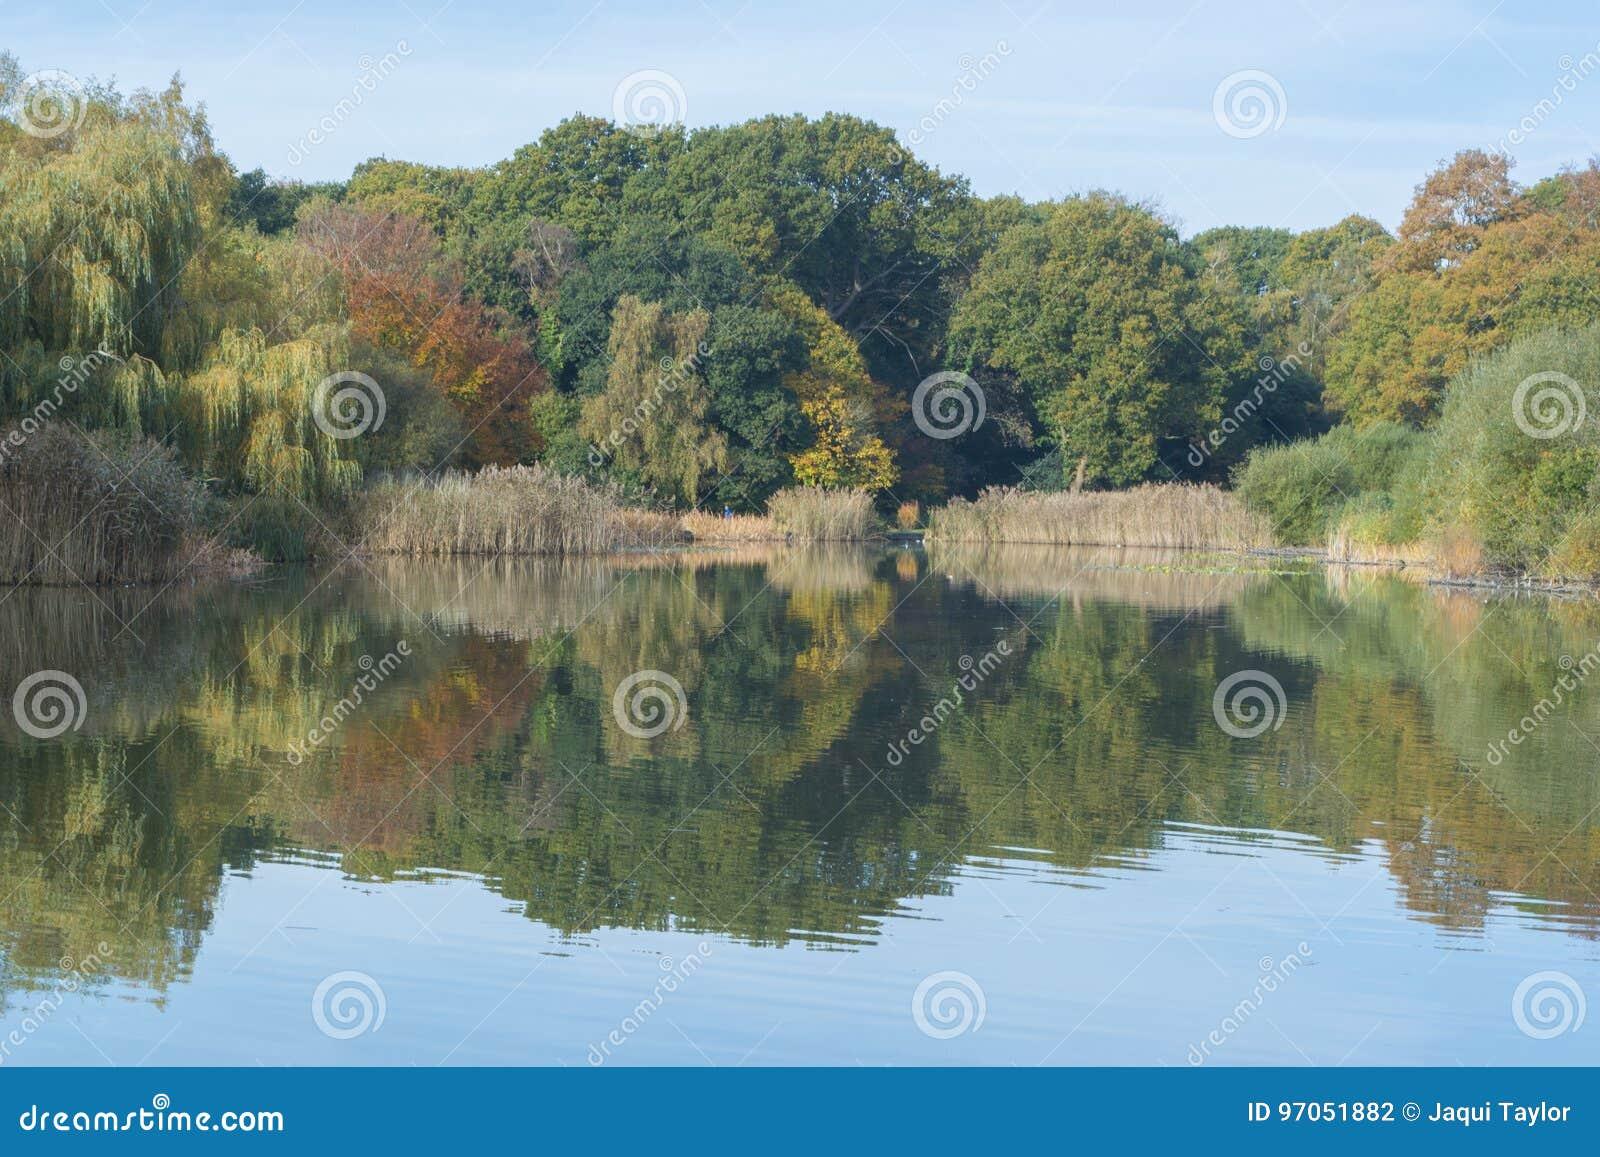 The Ornamental Pond Southampton in Autumn